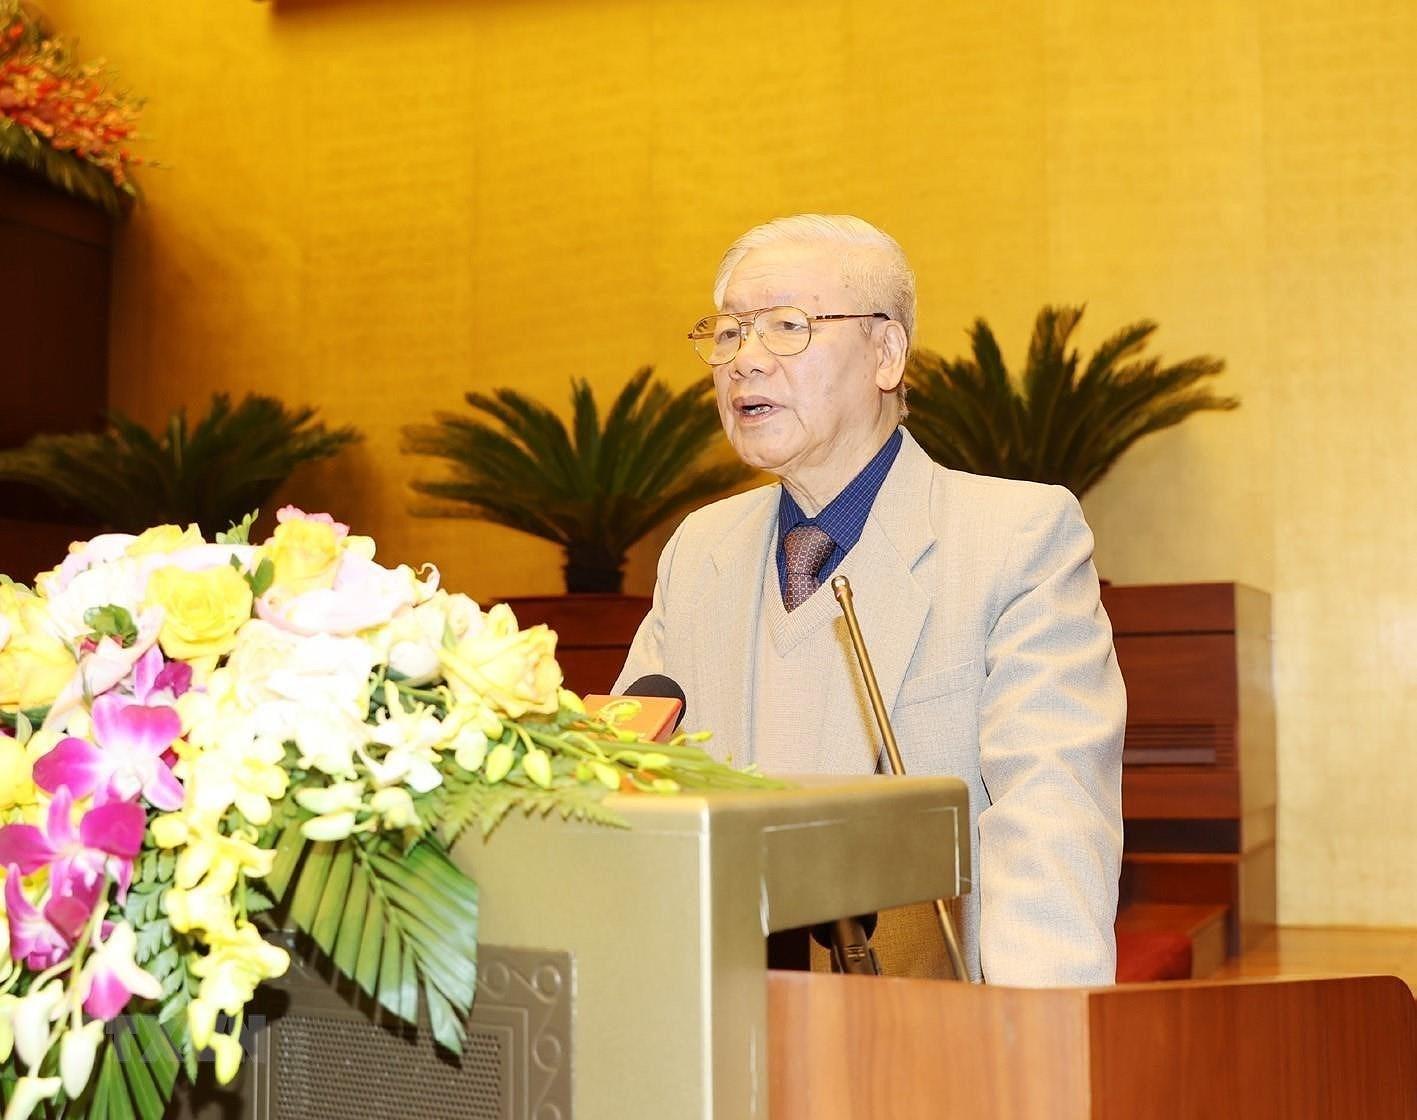 Tong Bi thu, Chu tich nuoc chi dao Hoi nghi trien khai cong tac bau cu hinh anh 2